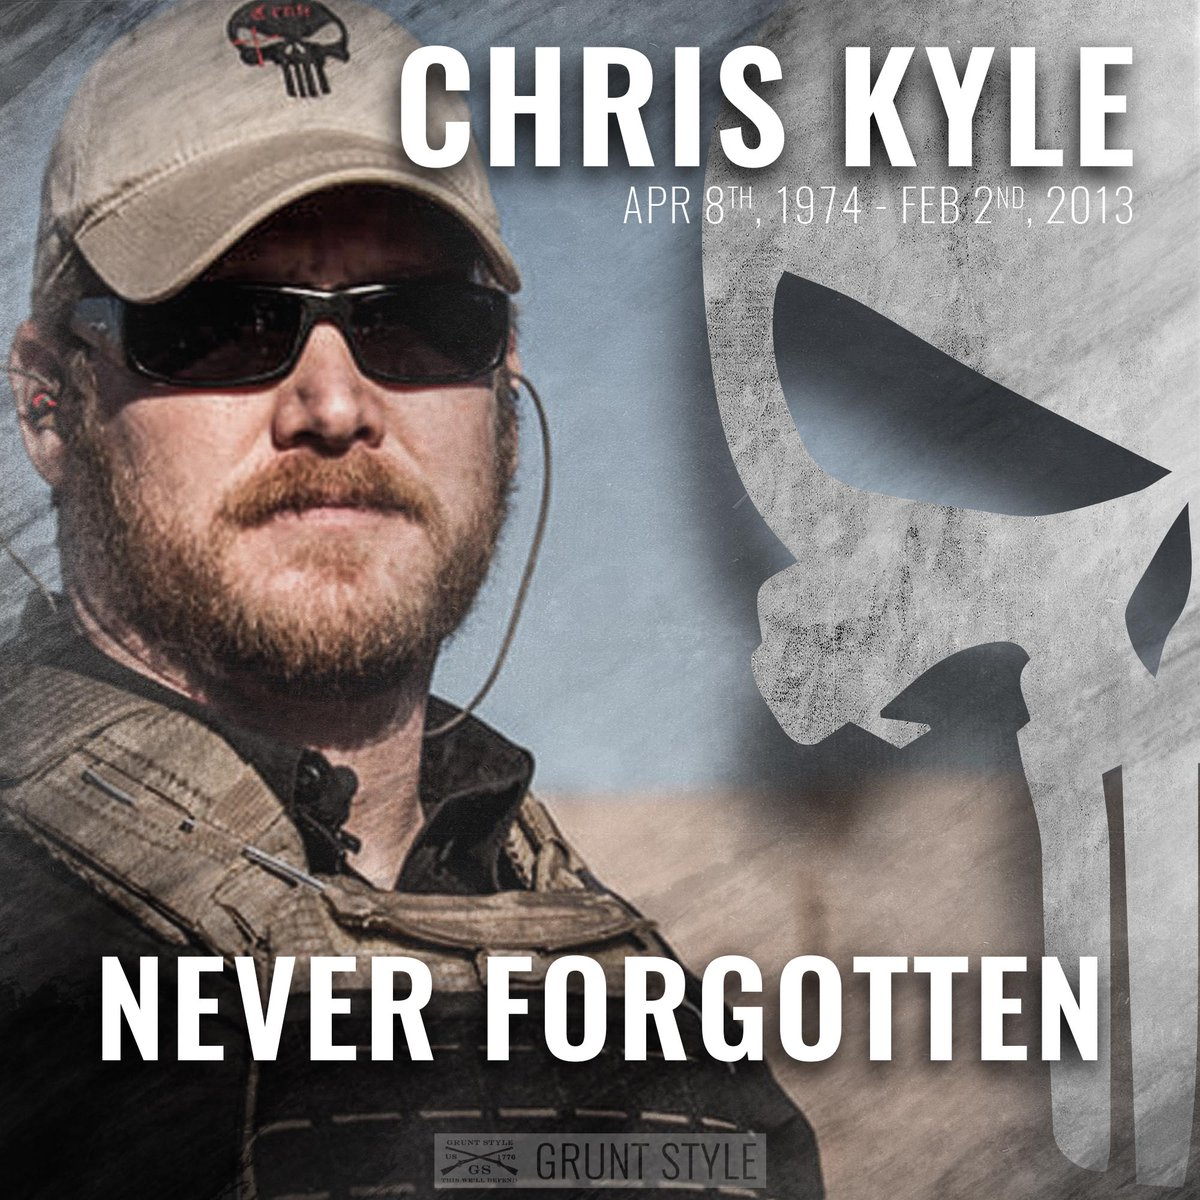 Lest We Forget, #ChrisKyle #NeverForget https://t.co/dqjaGiIKZ3